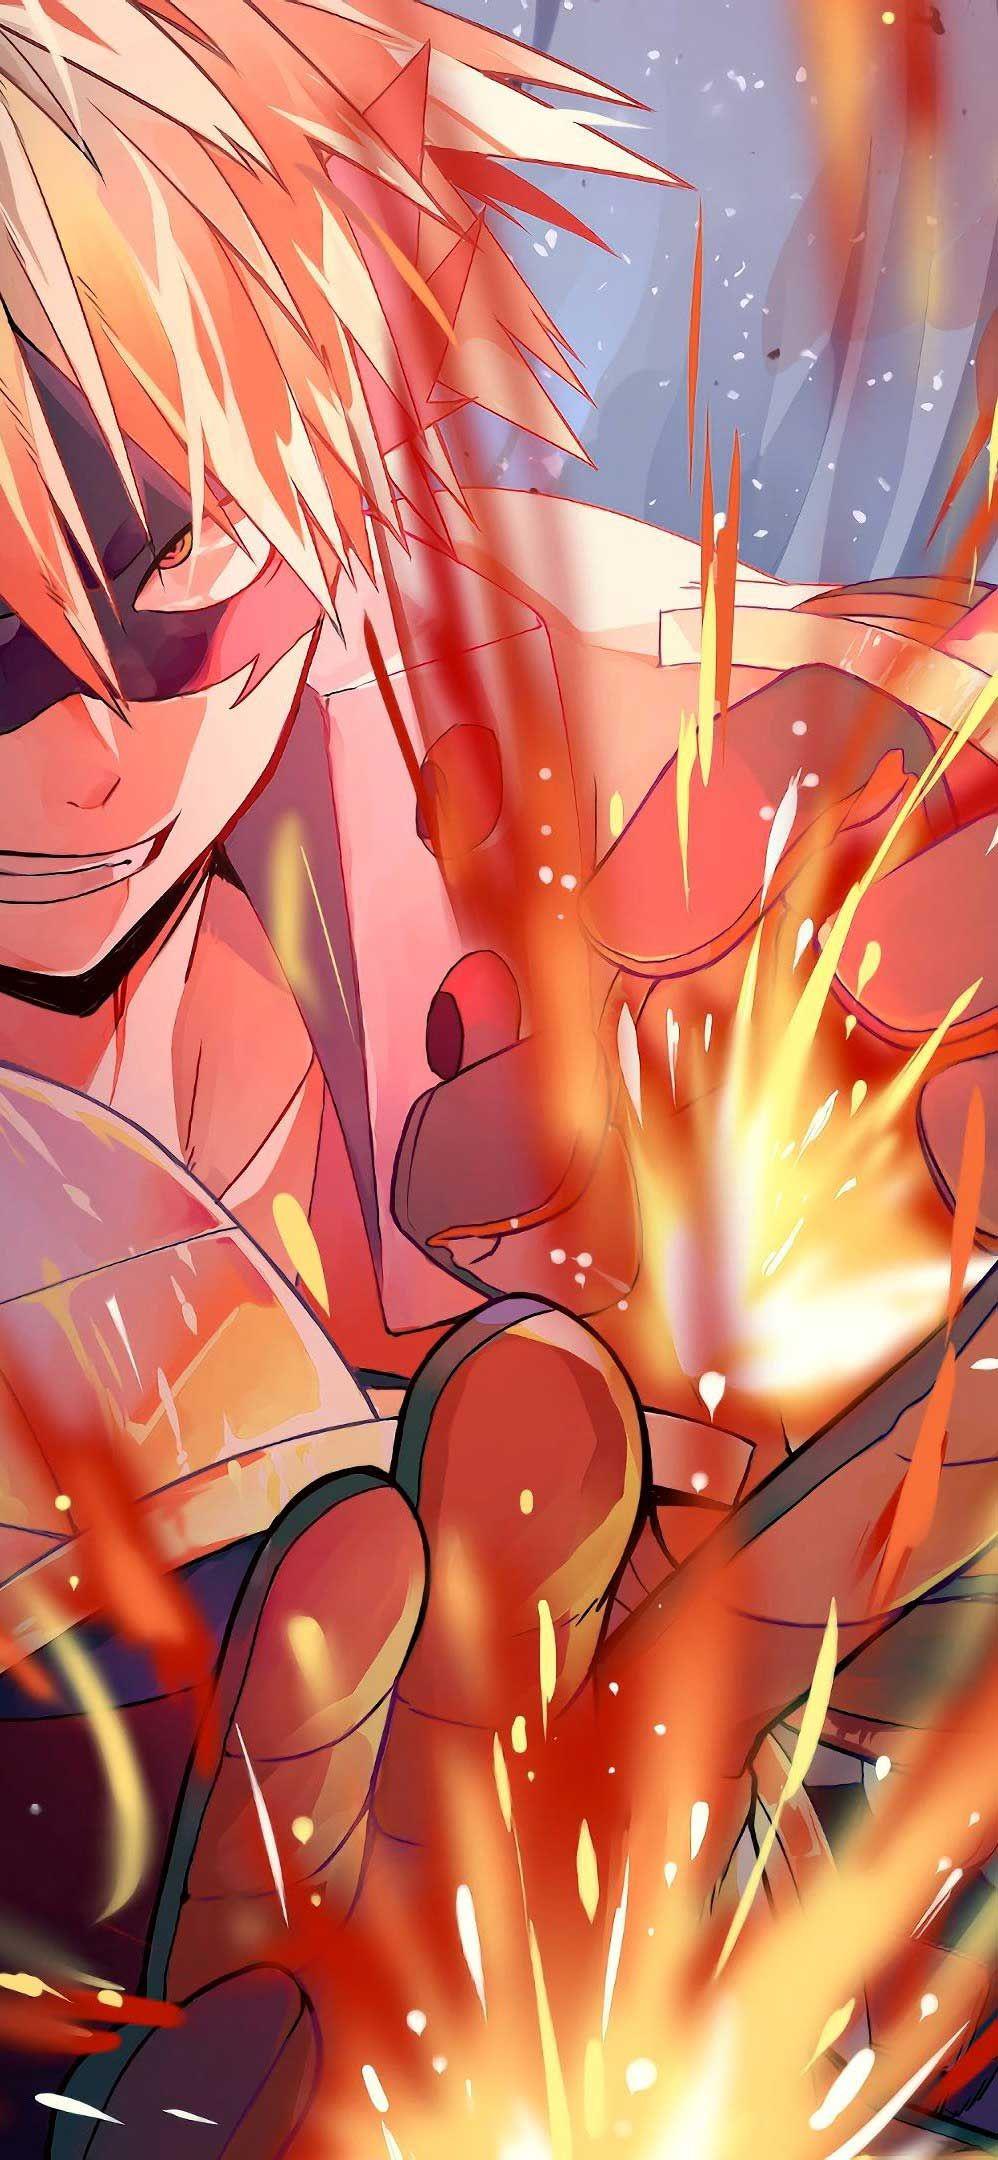 Katsuki Bakugou My Hero Academic K O Iphone Pro Ma Wallpaper In 2020 Hero Wallpaper Anime Wallpaper Cute Anime Wallpaper